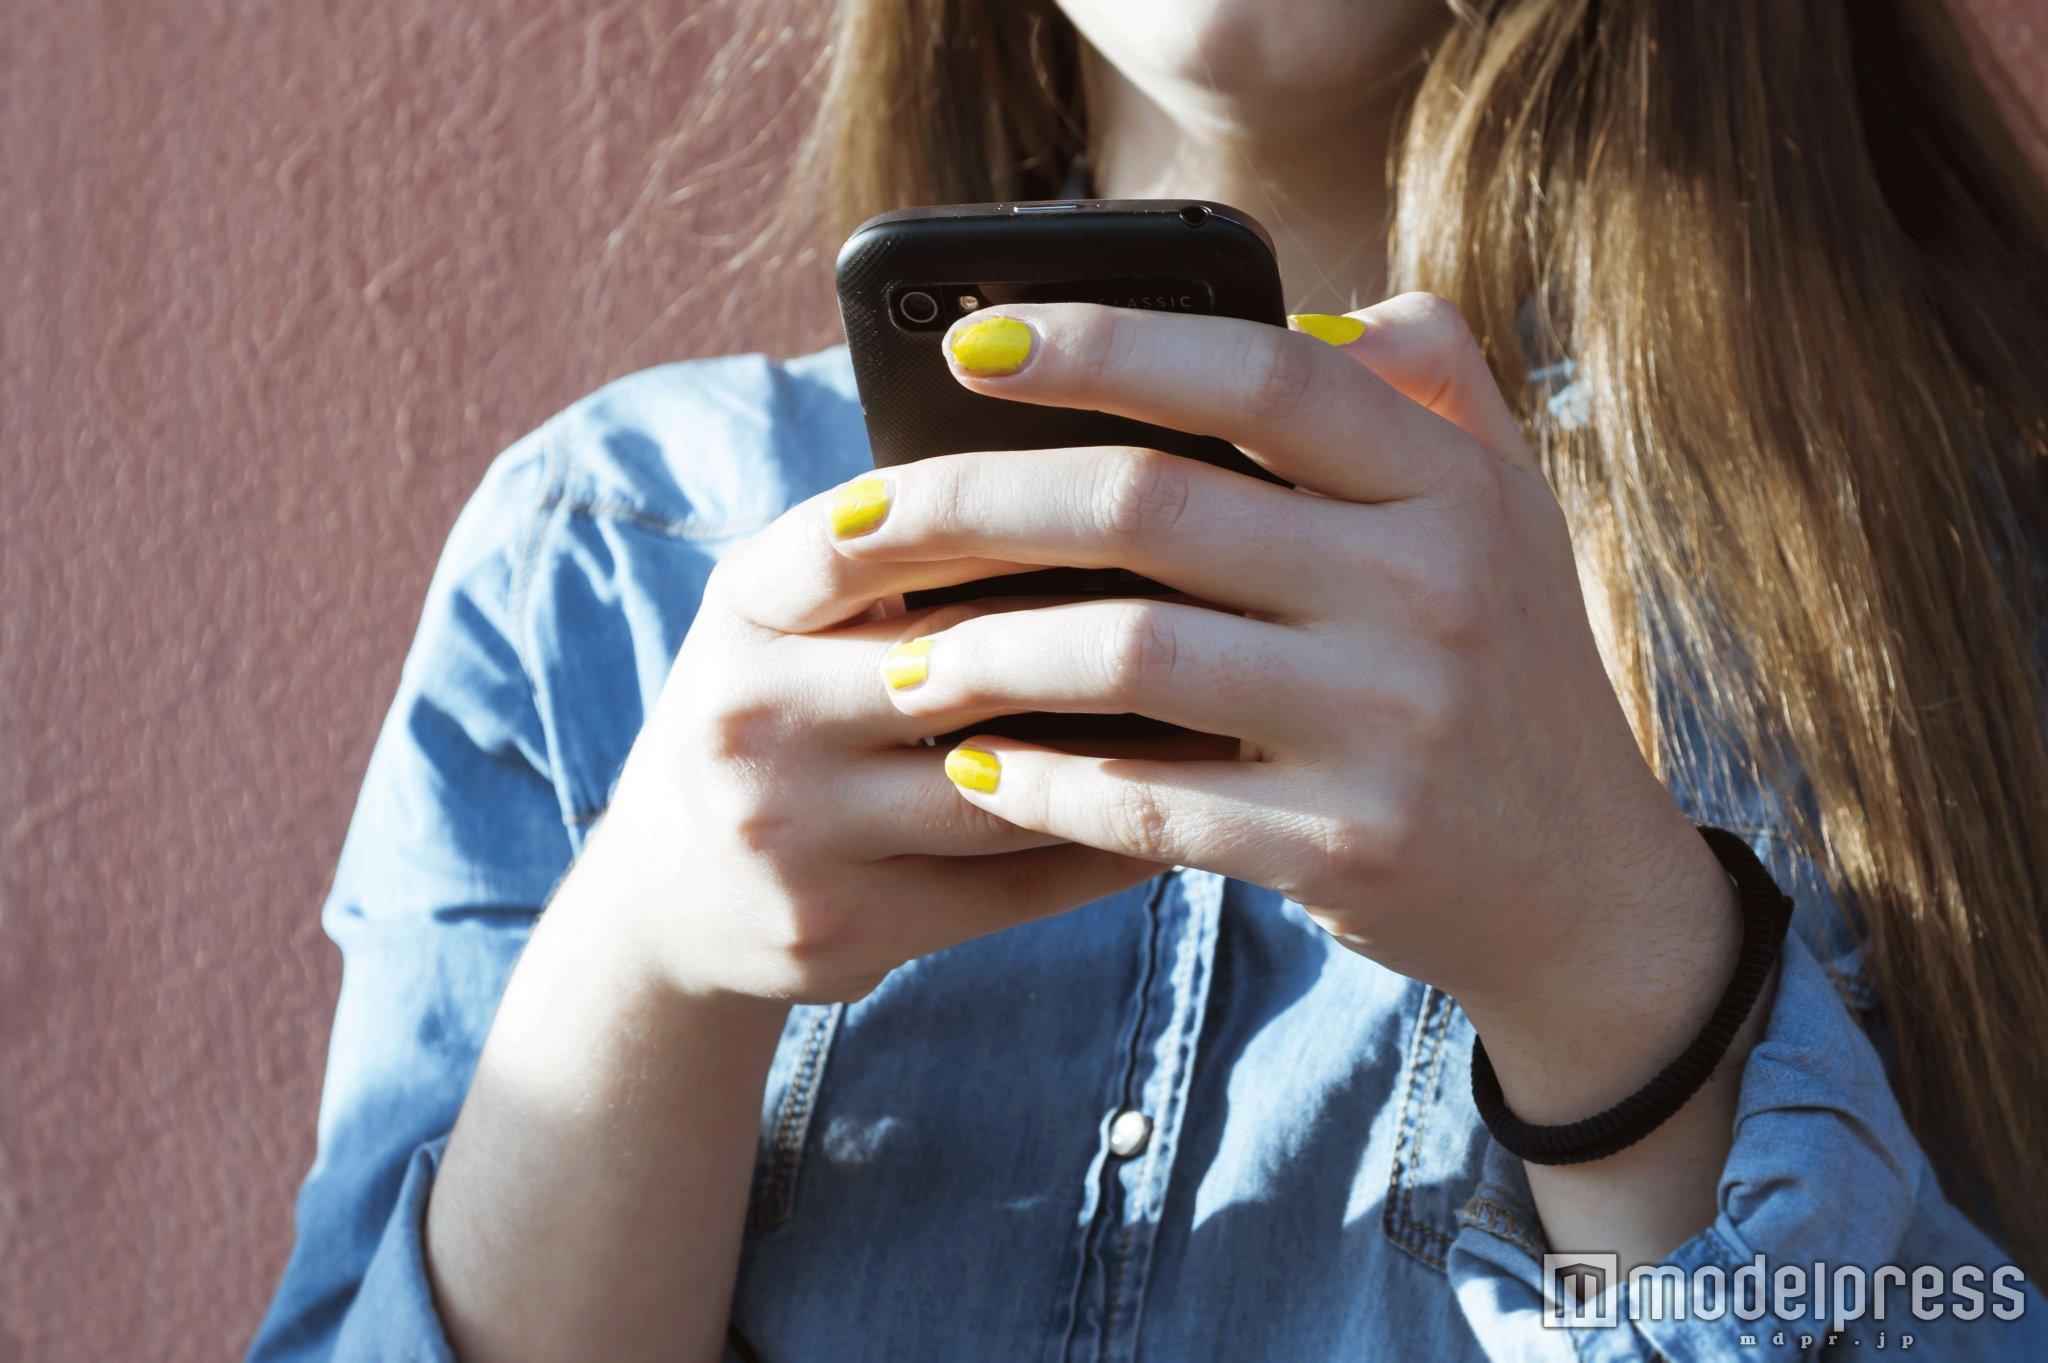 LINEの話題7選 アパレル女子も実践したい好きな人との会話を盛り上げるコツ(photo-by-lpictures/Fotolia)